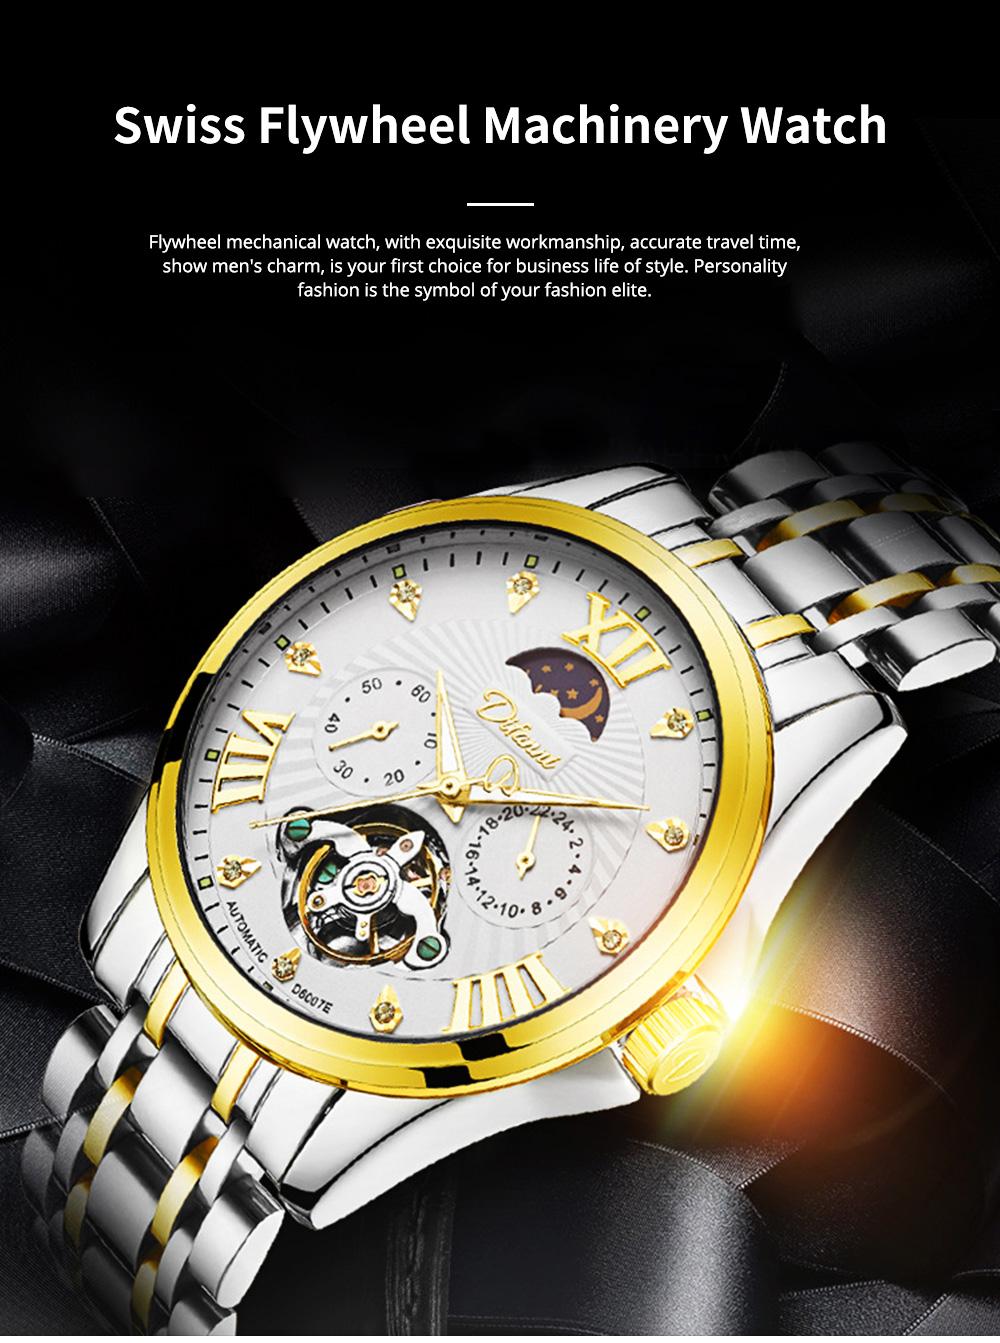 Classic Men's Watch Swiss Flywheel Machinery Watch Fully Automatic Machinery Watch Swiss Geneva Ribbon Machinery Watch 0